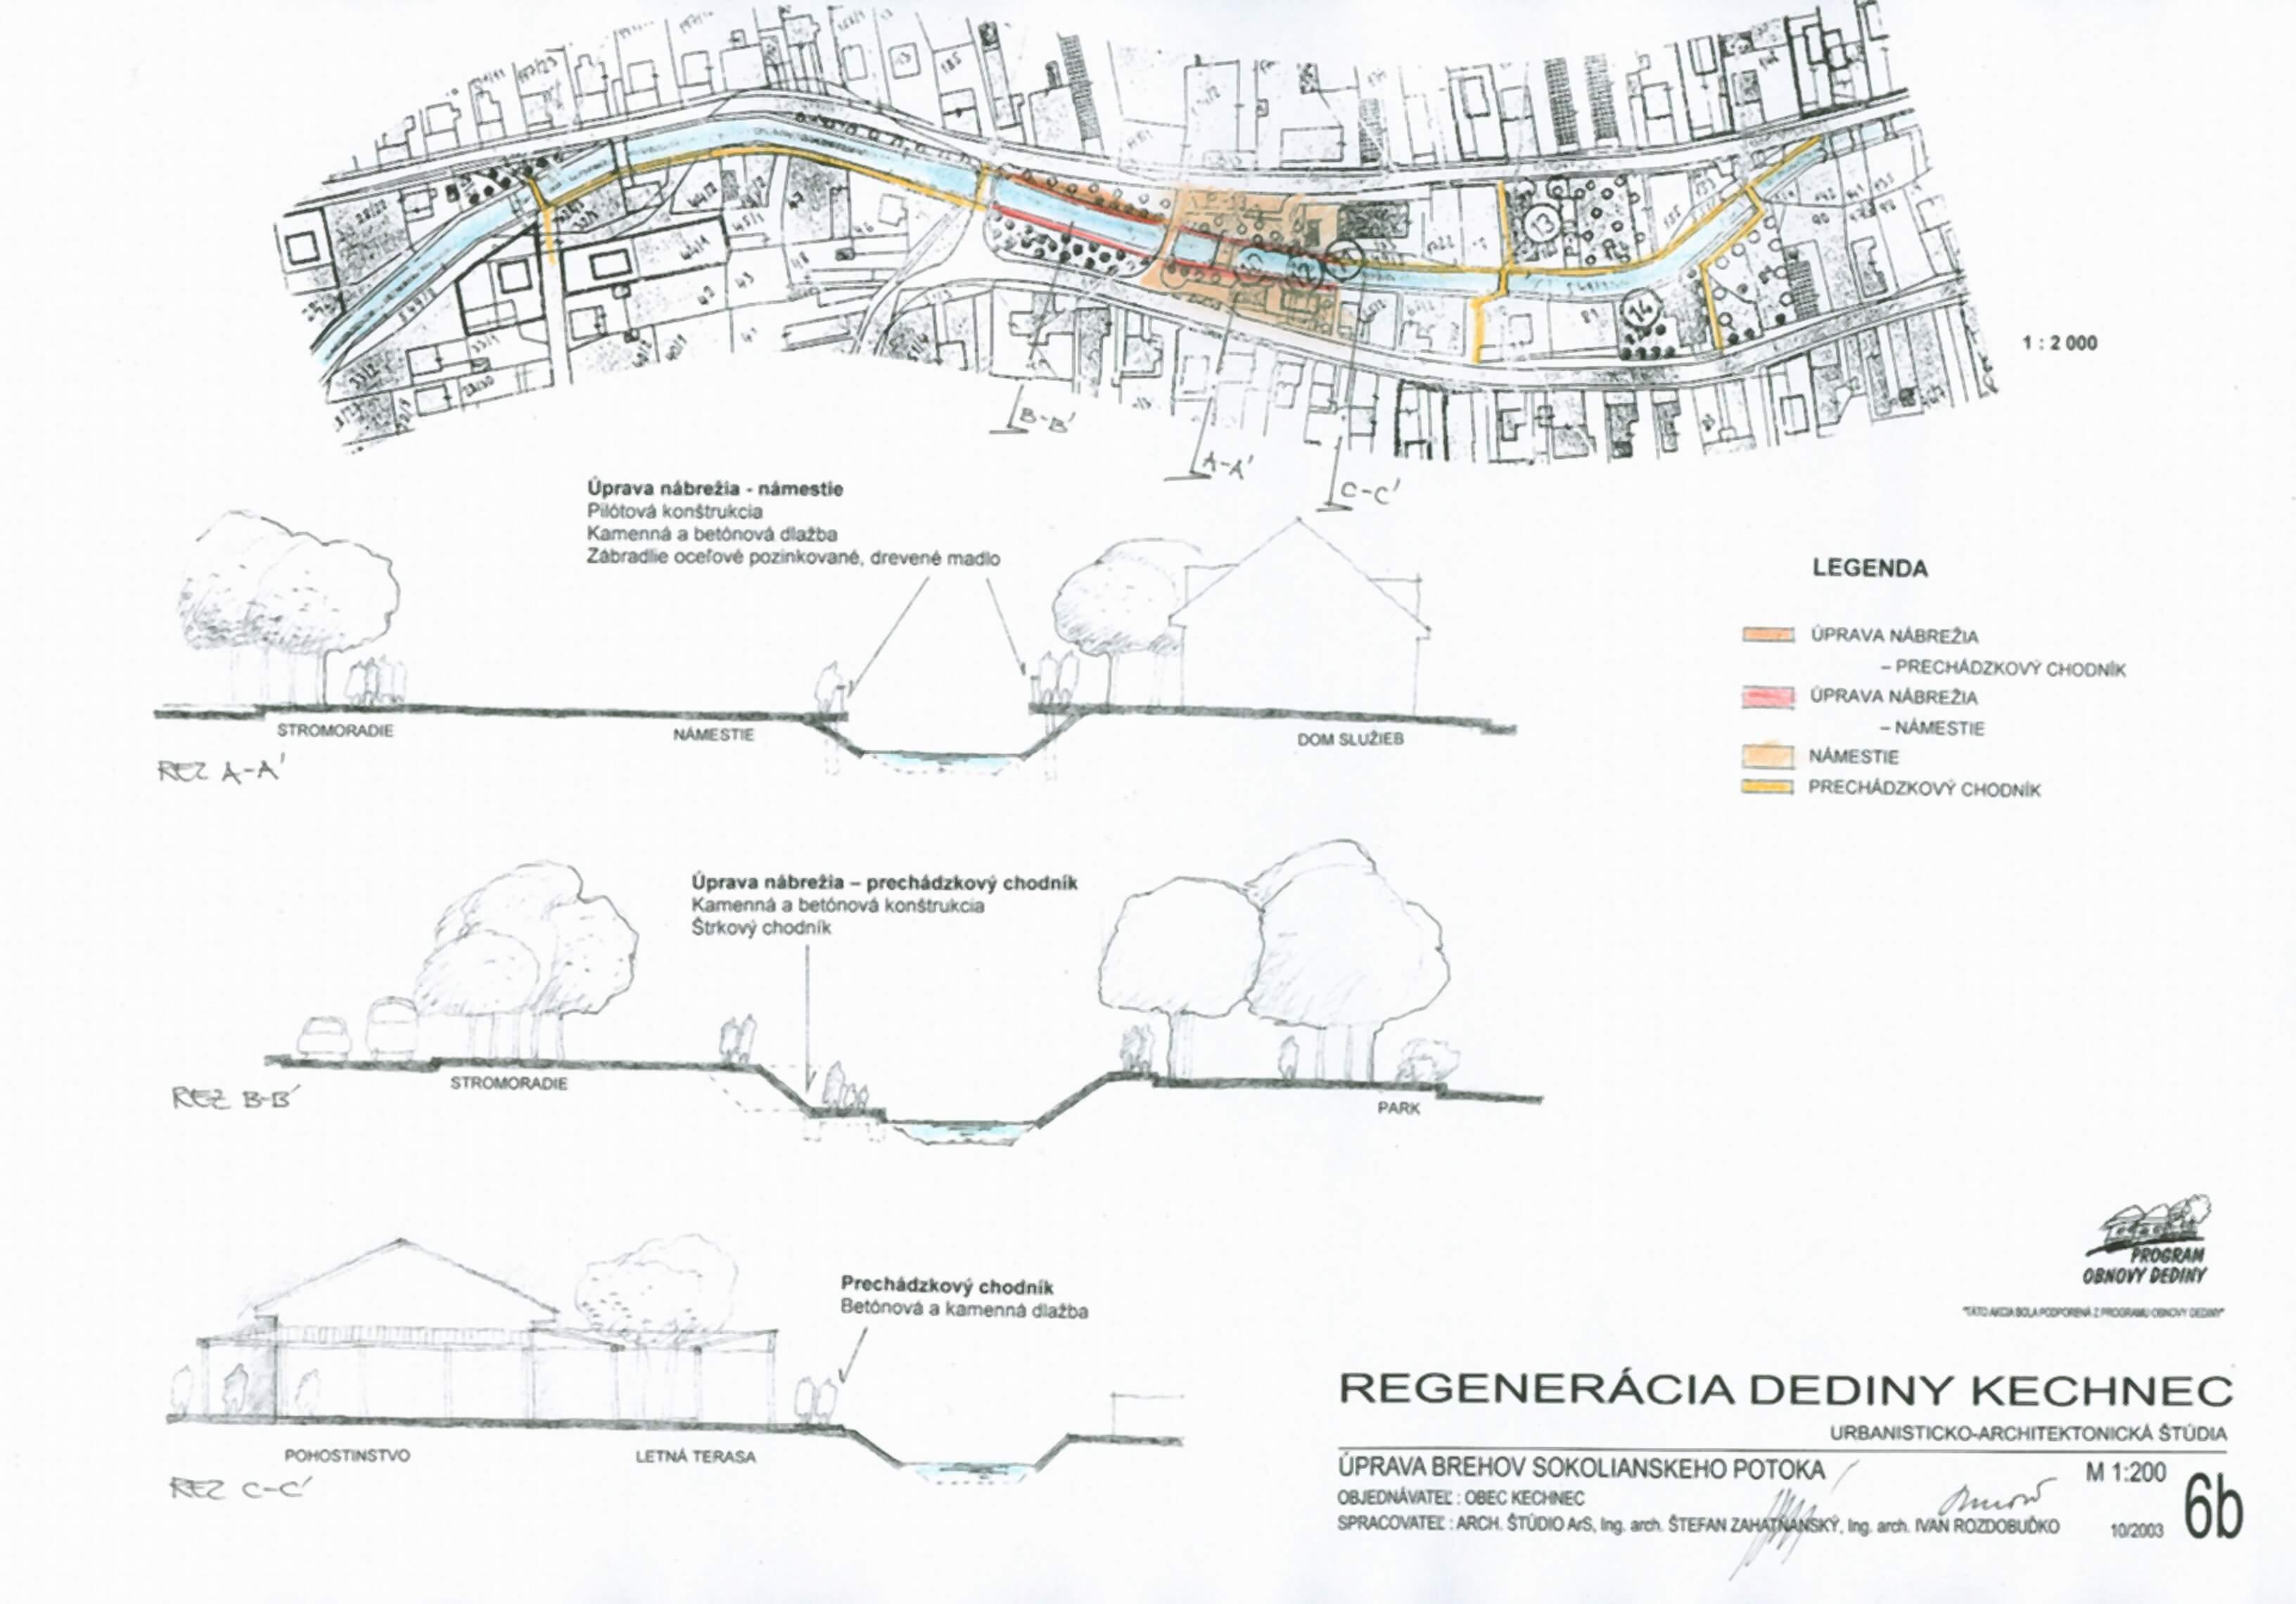 Leveling of creek sides – the Sokoliansky creek